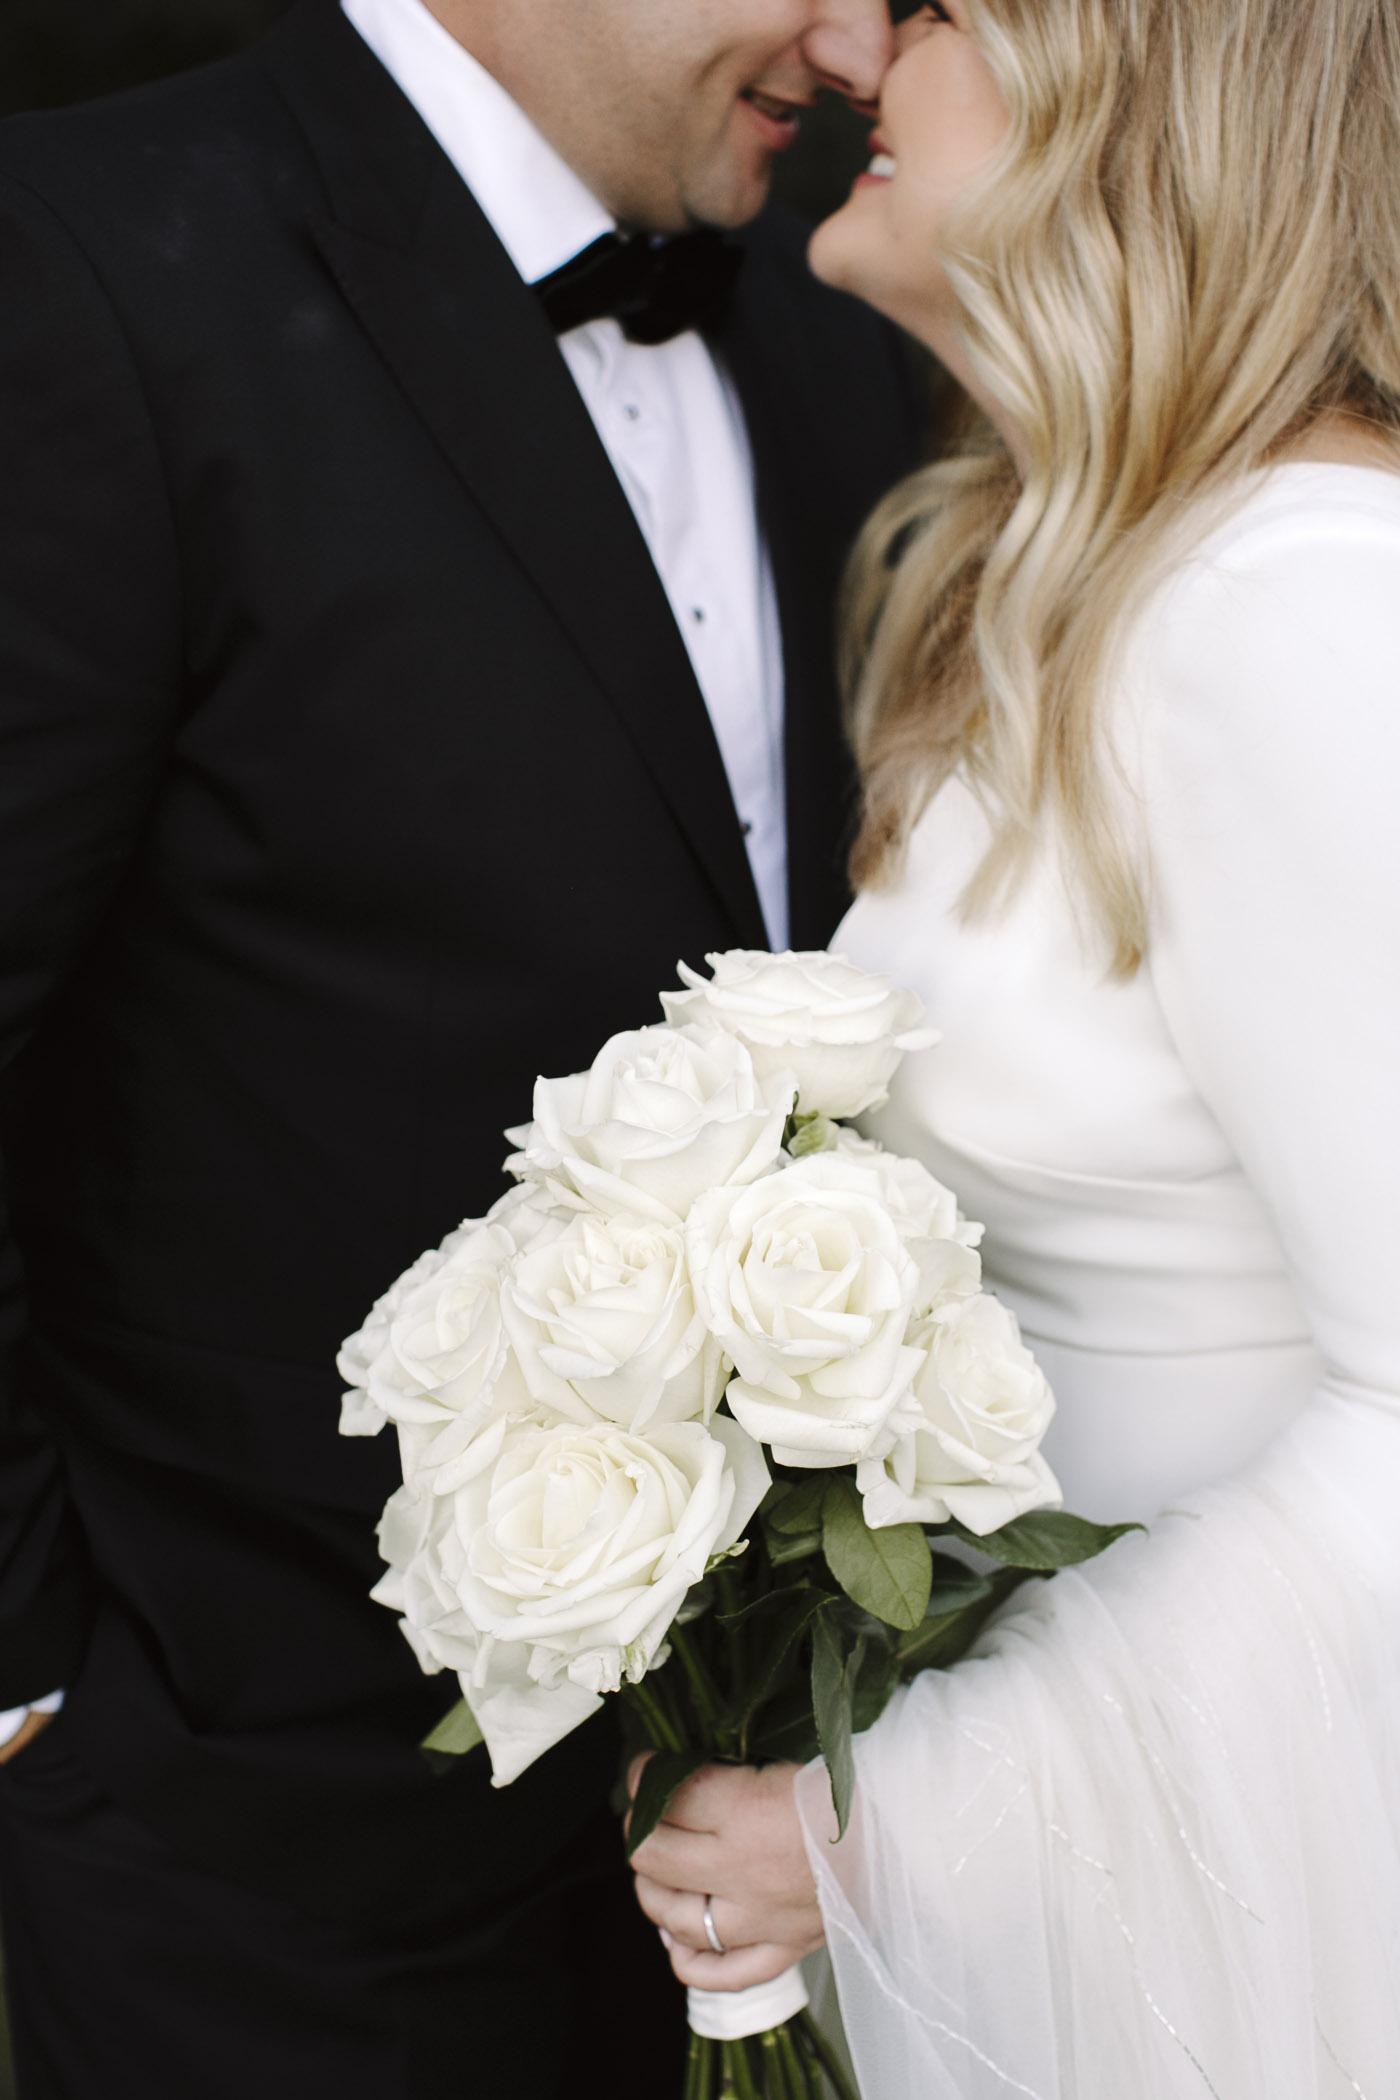 170707_justinaaron_wedding_krystal_greg_w-350.jpg